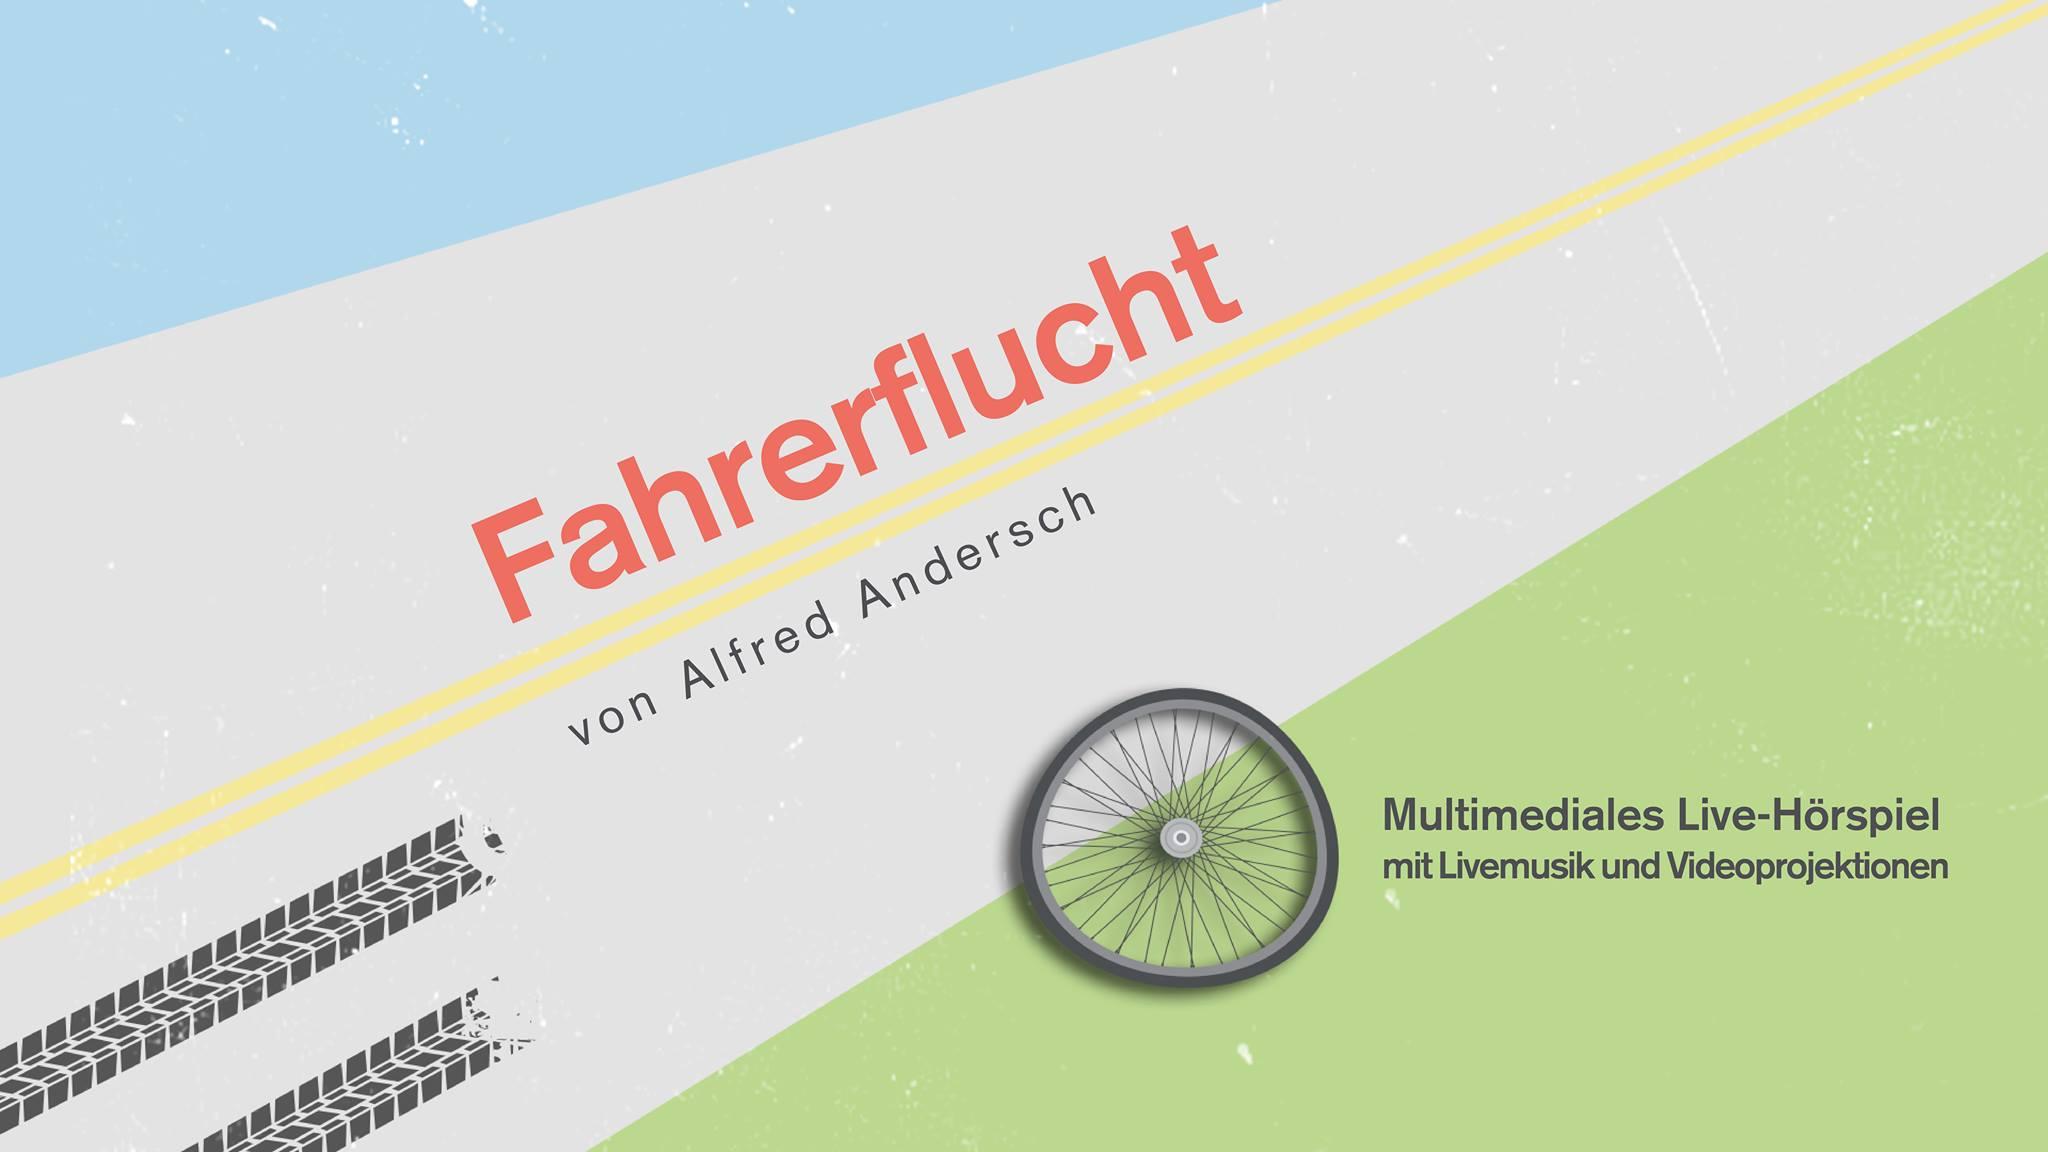 Fahrerflucht - Multimediales Live-Hörspiel-NUN-Kaffeehaus.jpg